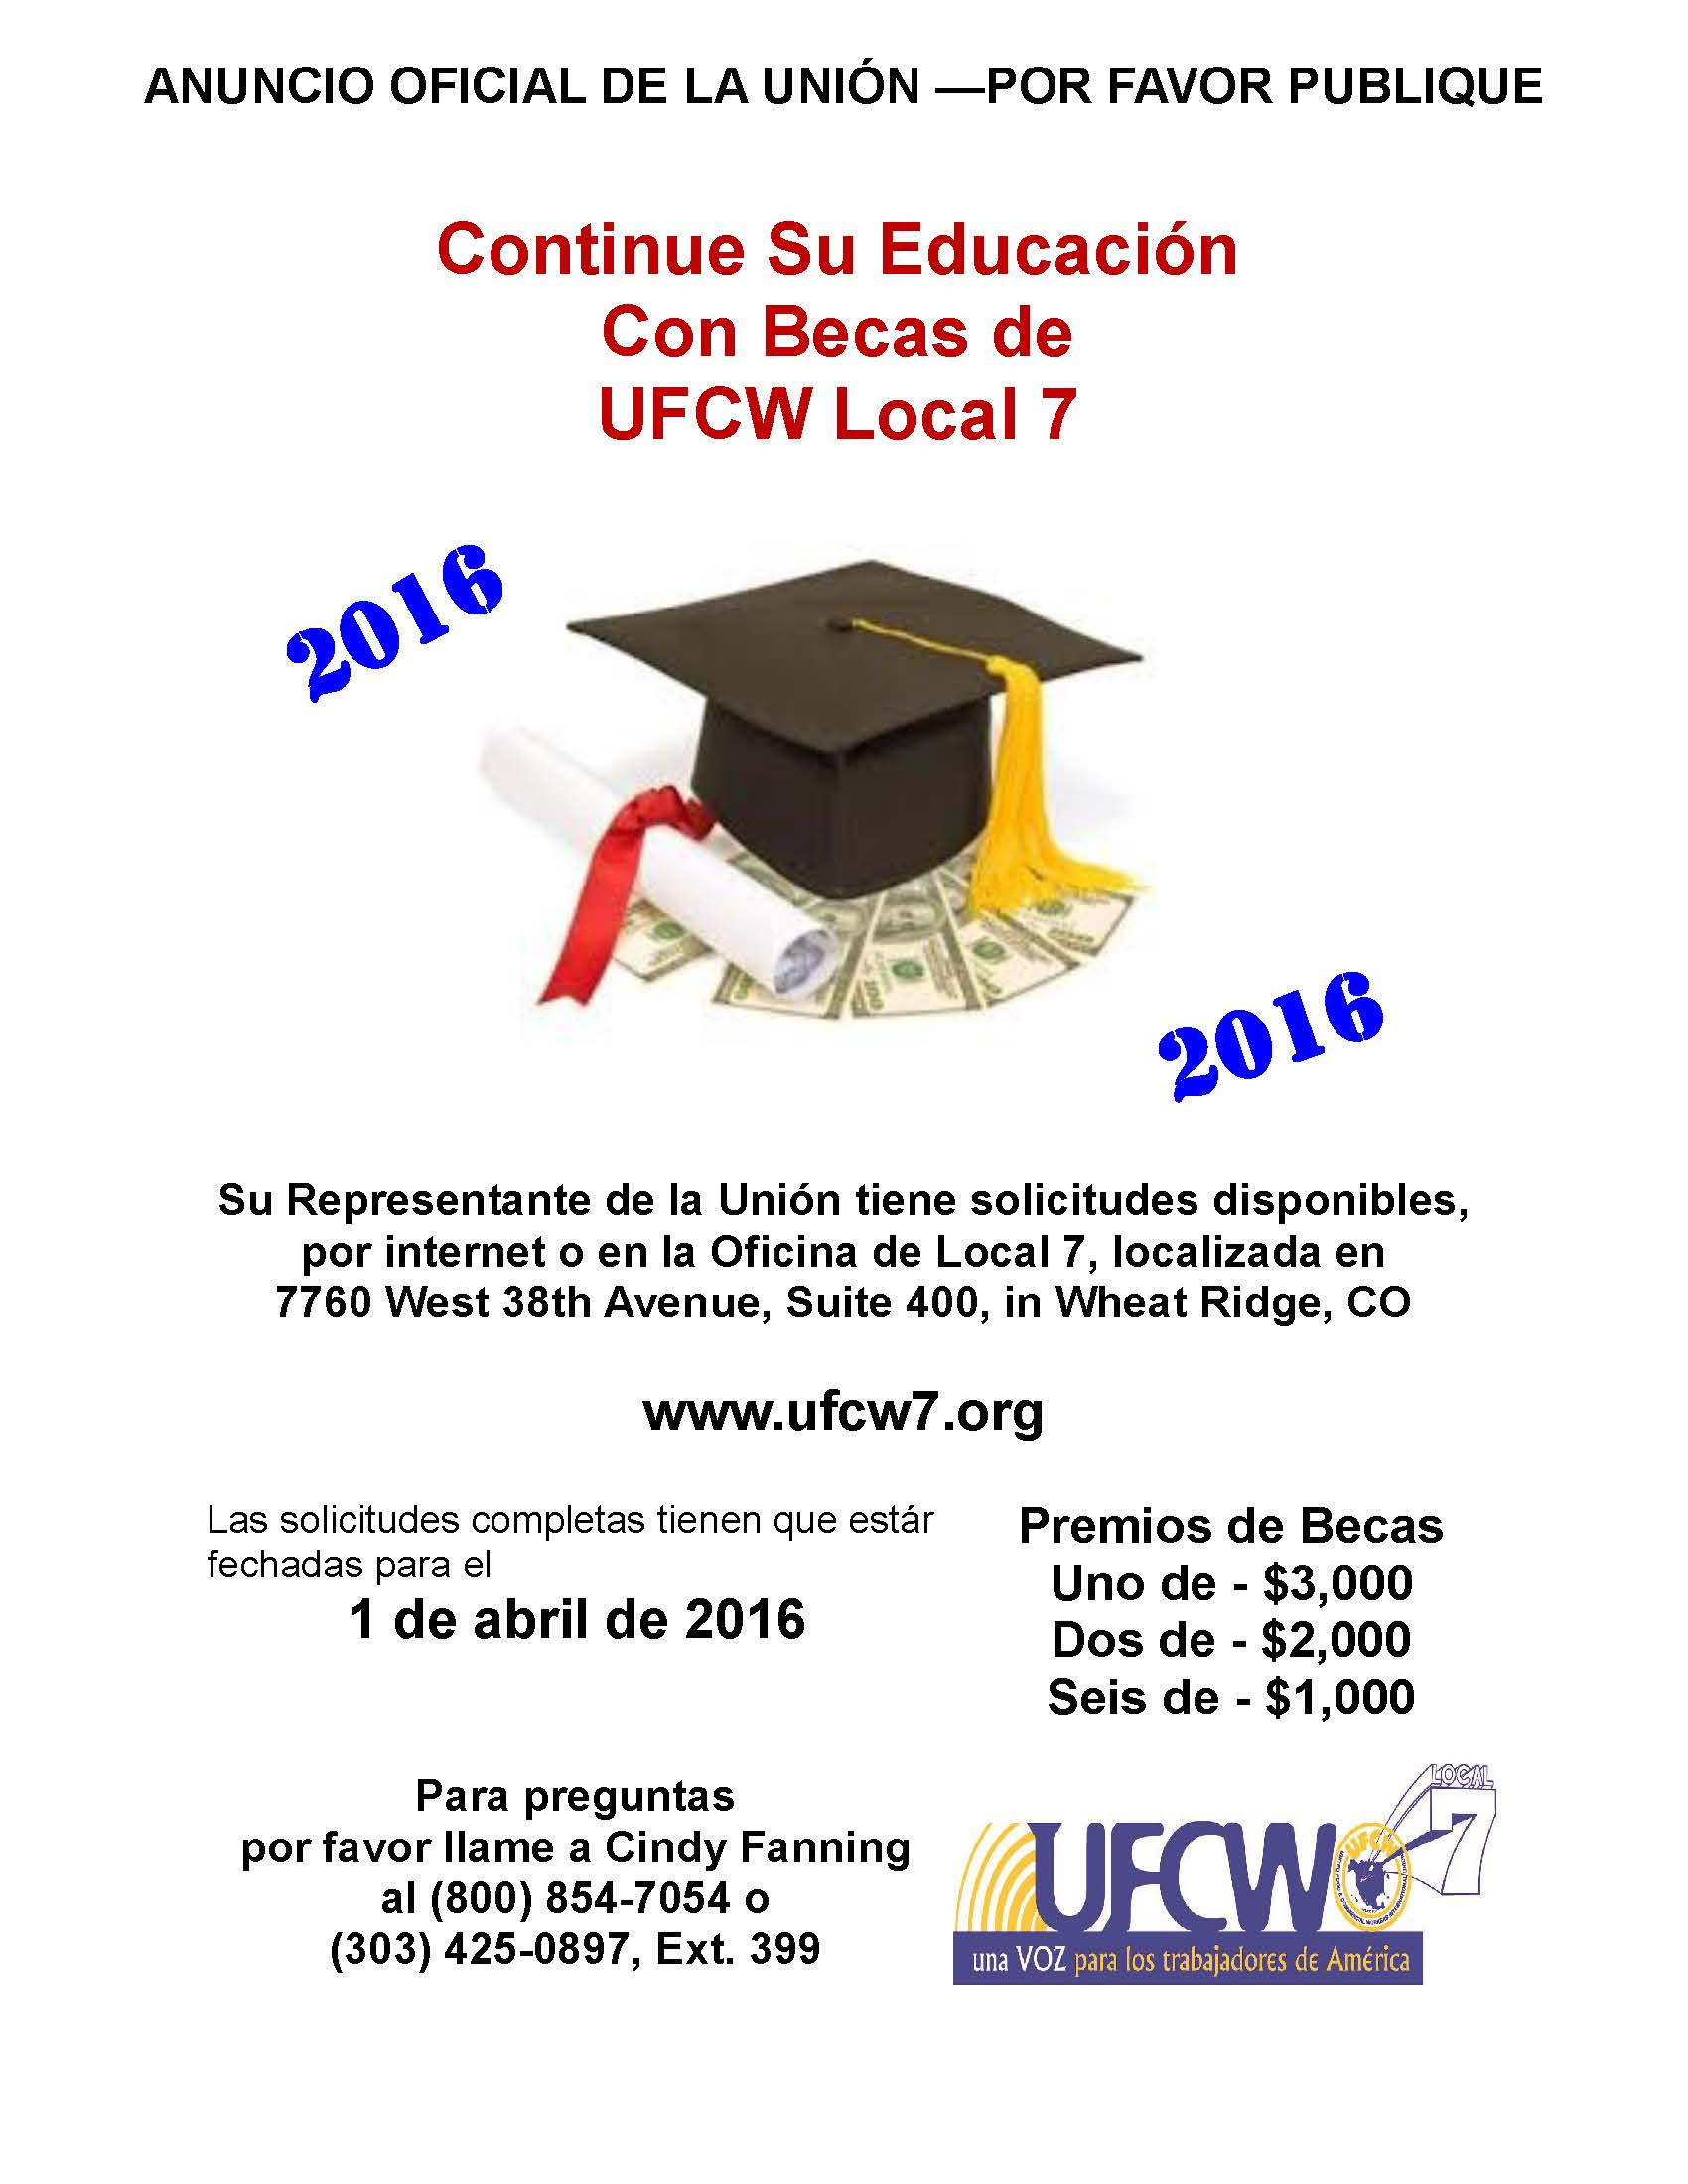 UFCW Local 7 Scholarship